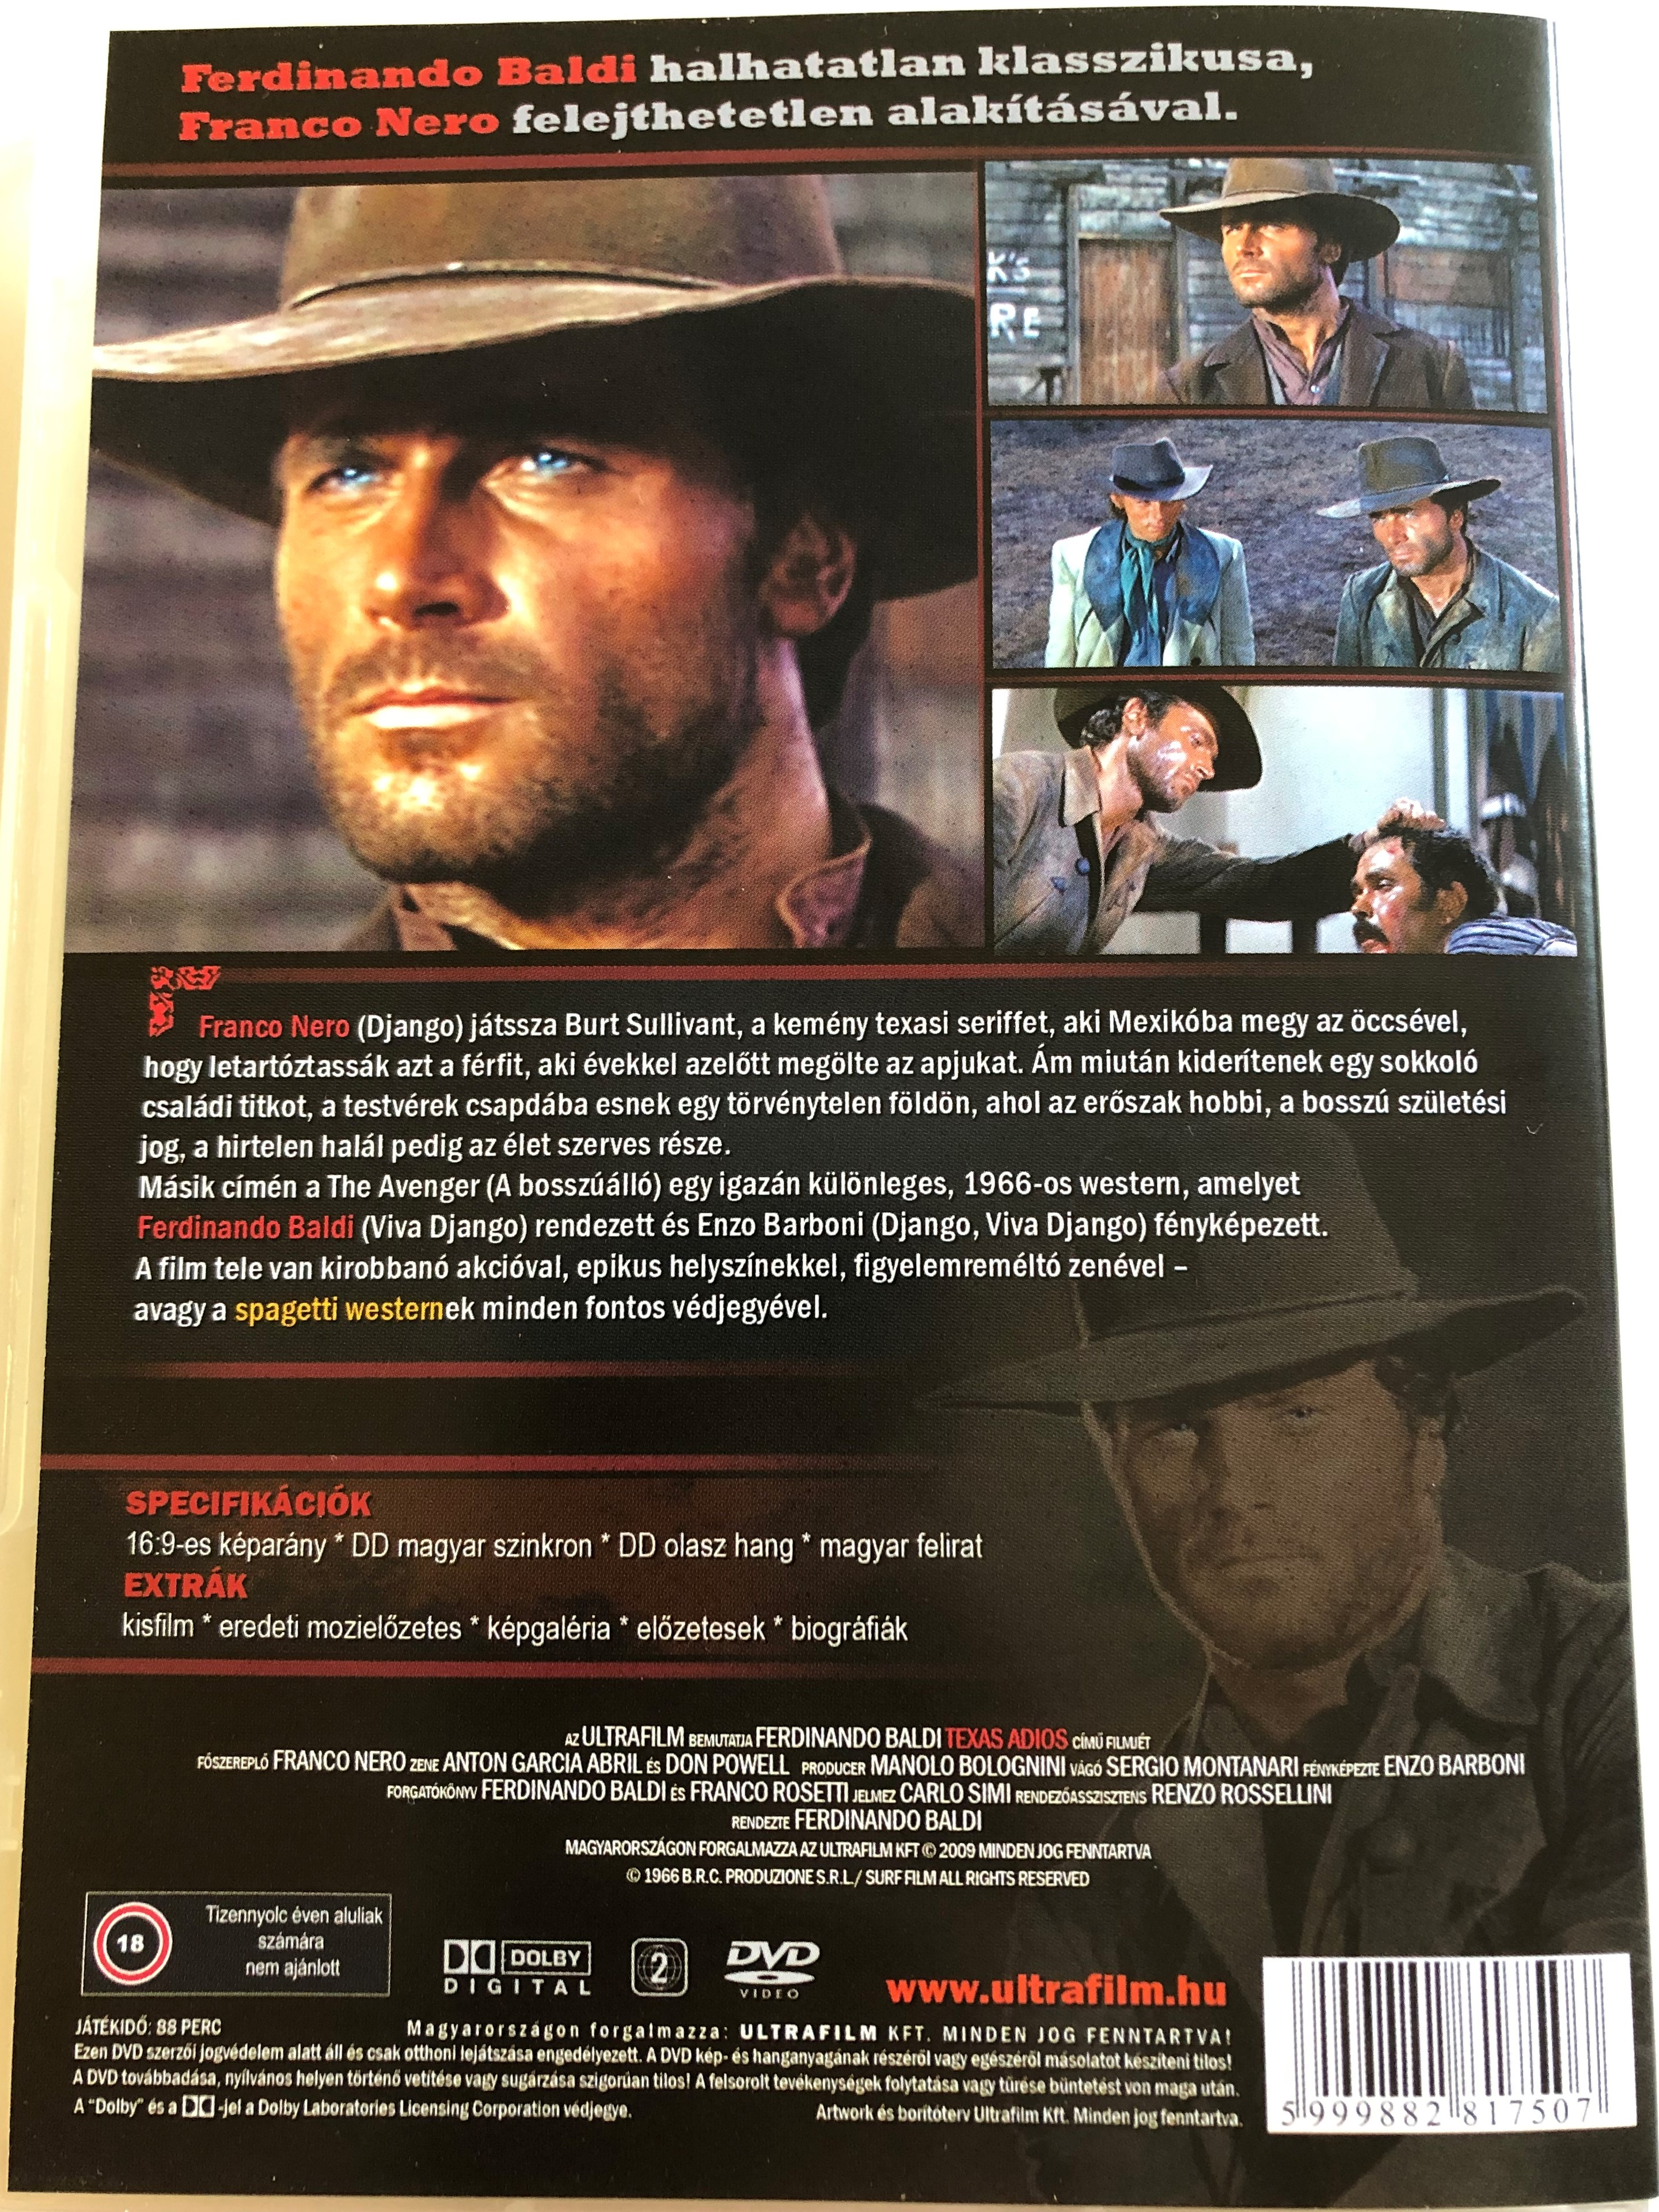 texas-adios-dvd-1966-texas-addio-directed-by-ferdinando-baldi-2.jpg